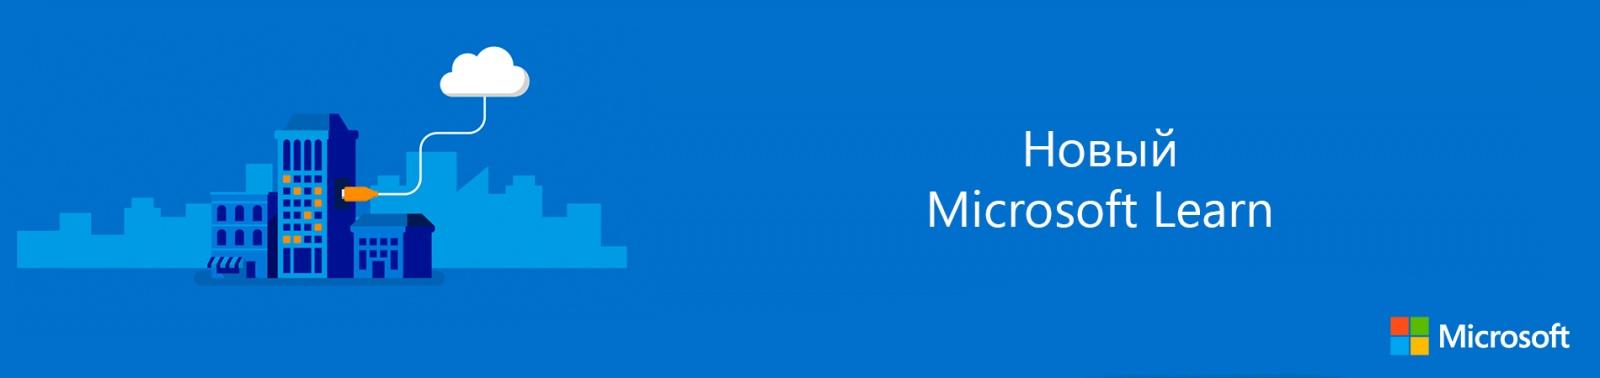 Знакомство с Microsoft Learn - 1